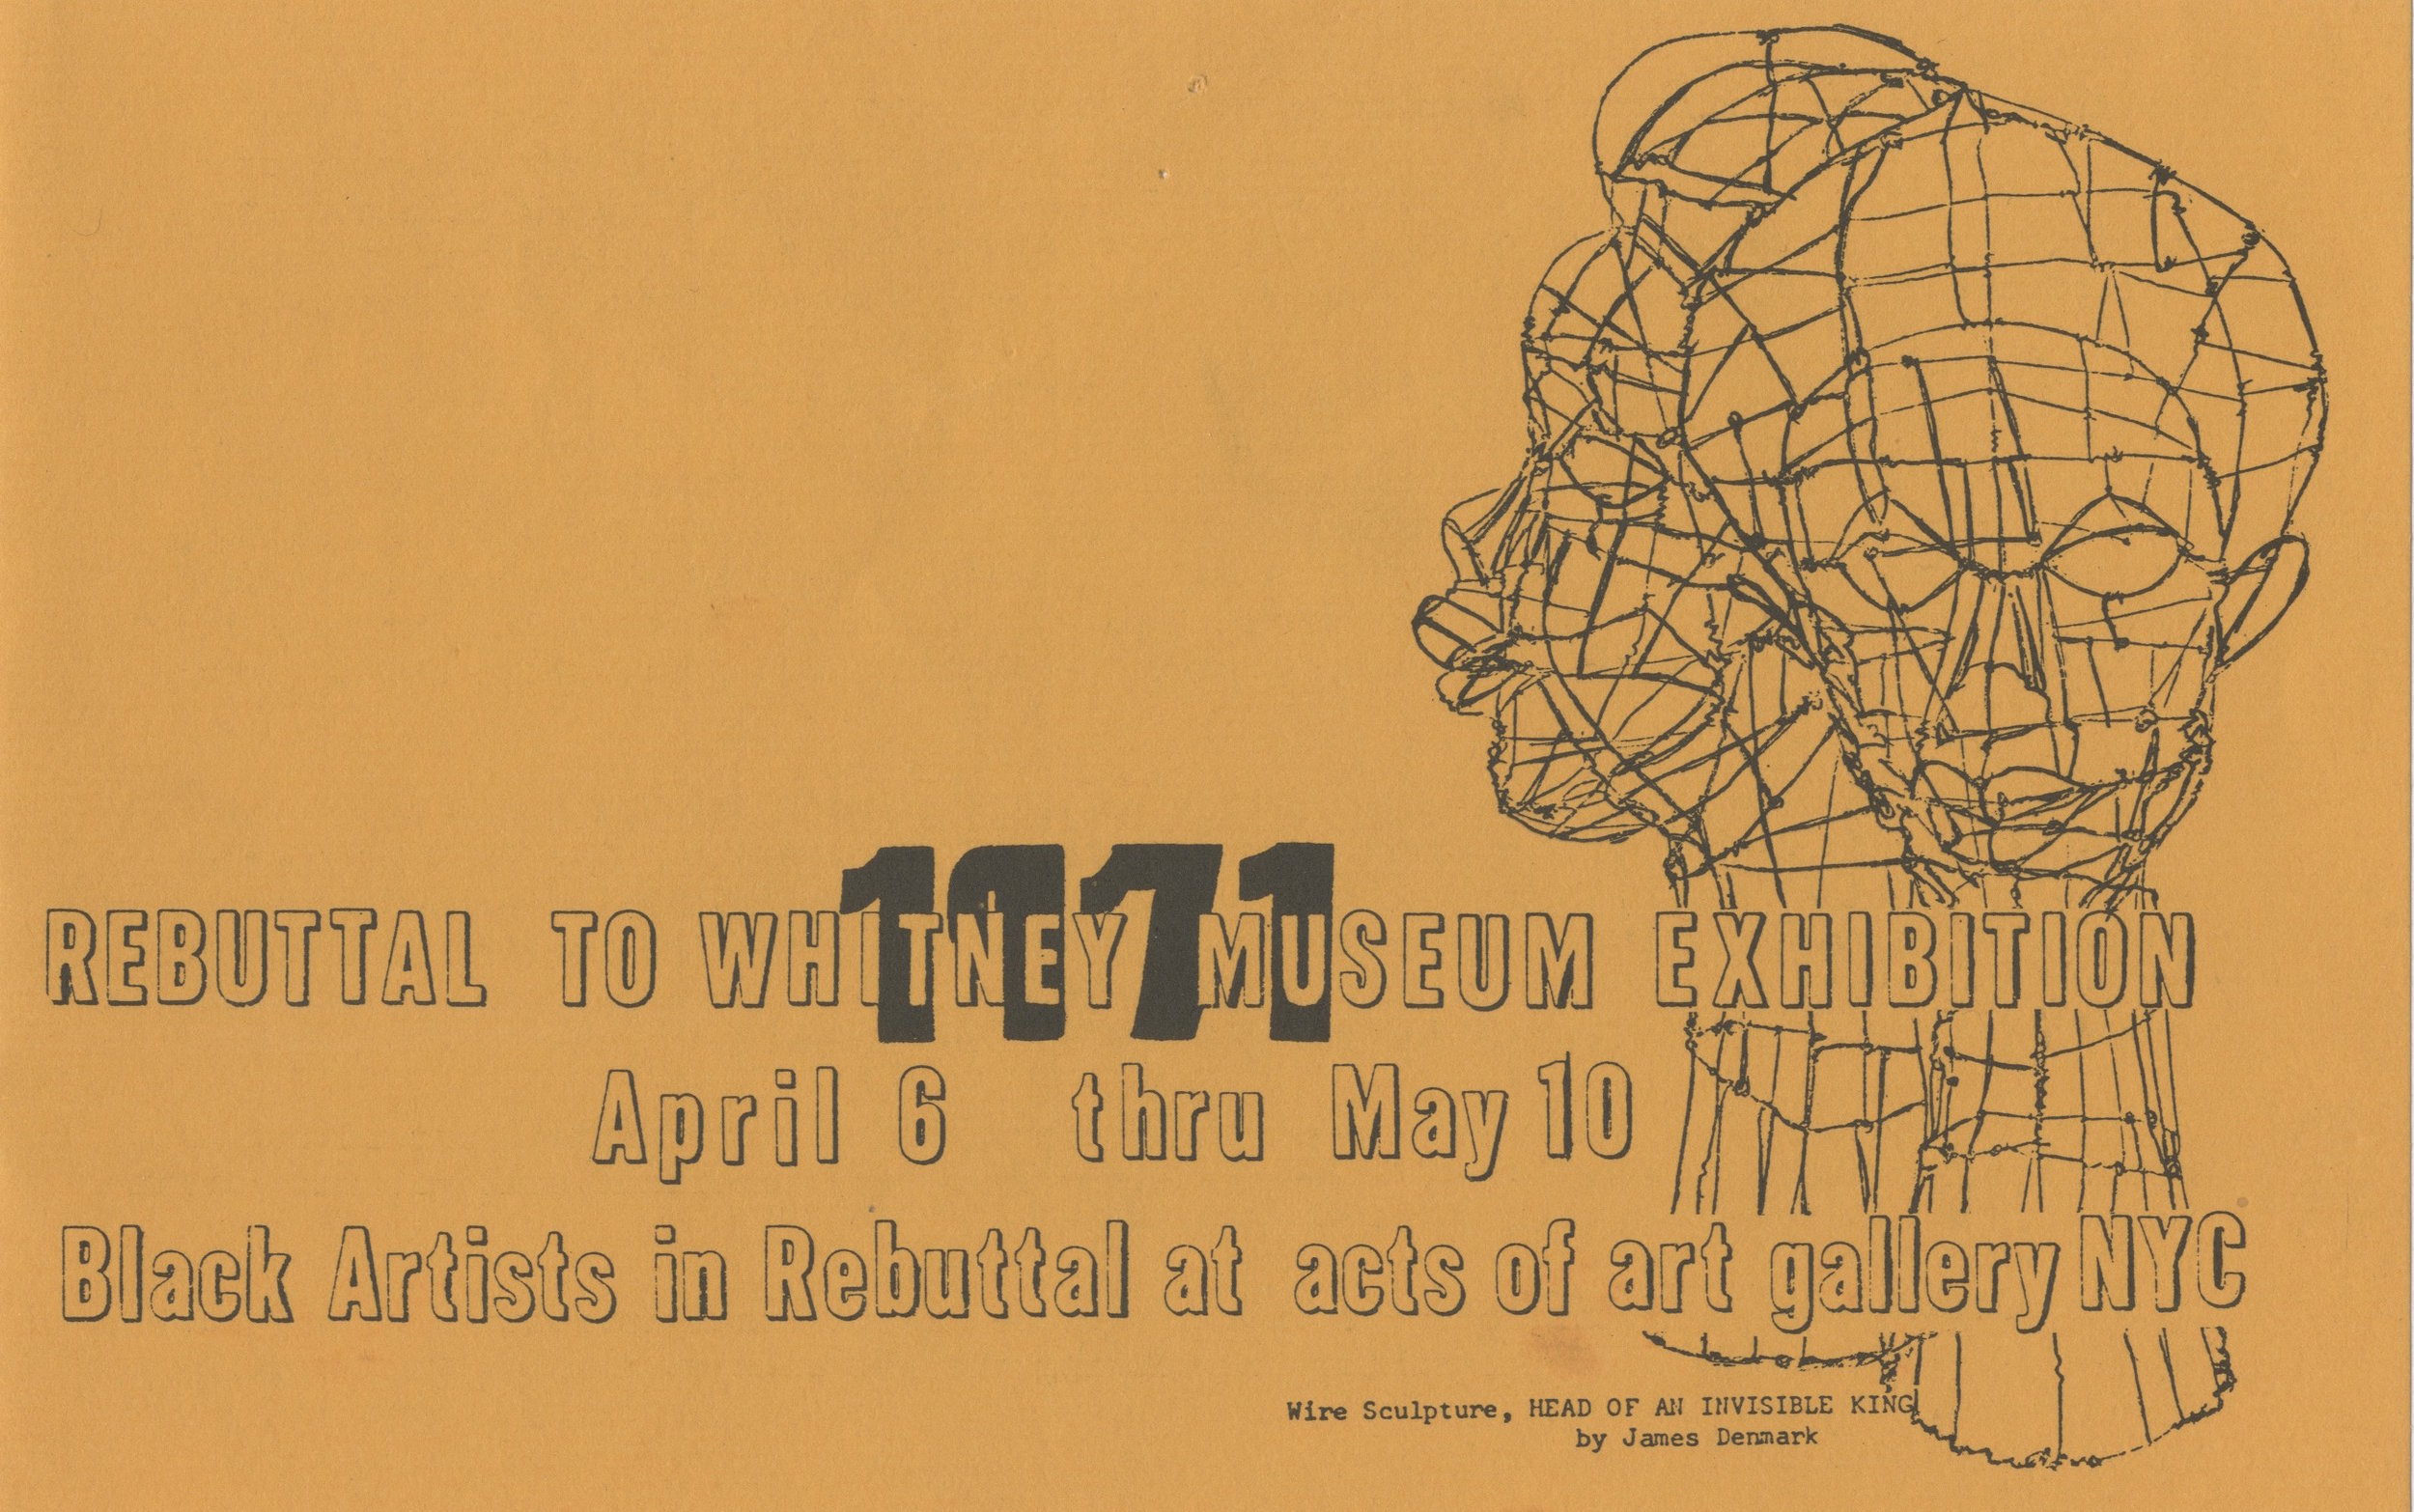 Calendar Leubsdorf Gallery Bertha Wiring Diagram Acts Of Art And Rebuttal In 1971